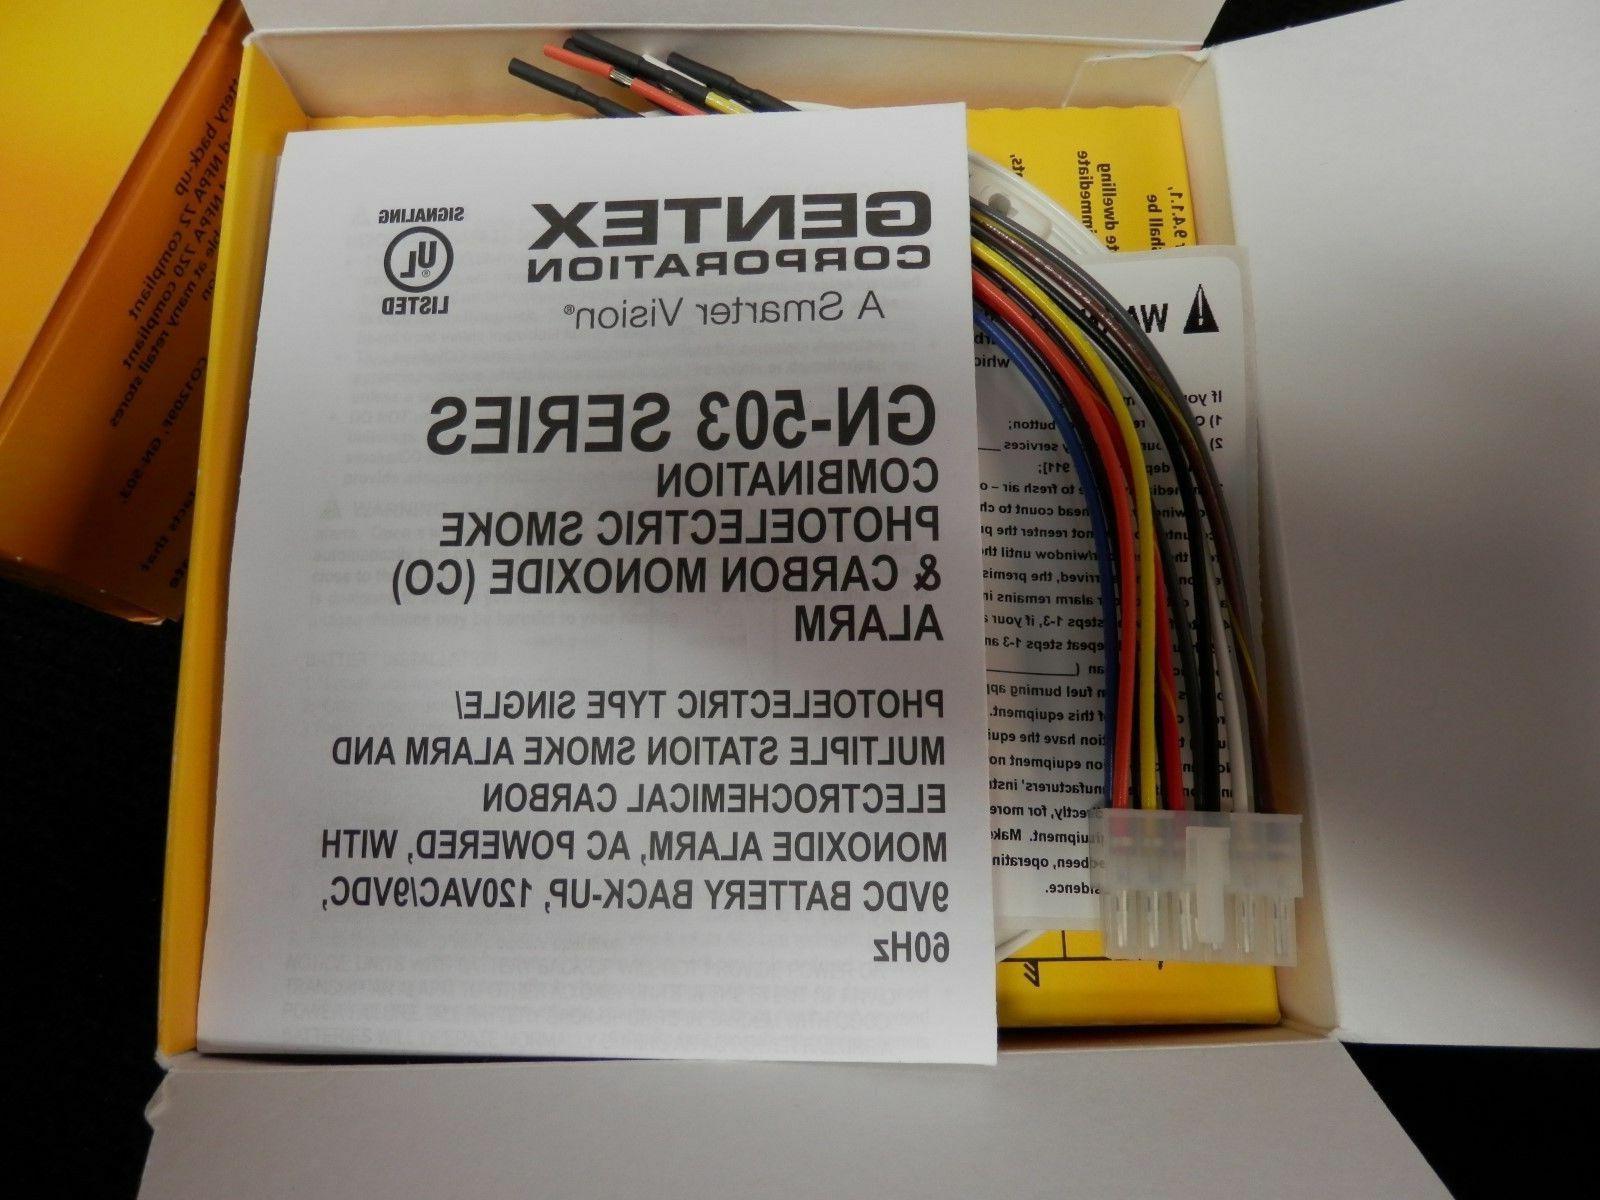 Gentex GN-503F Monoxide CO Combo 120V